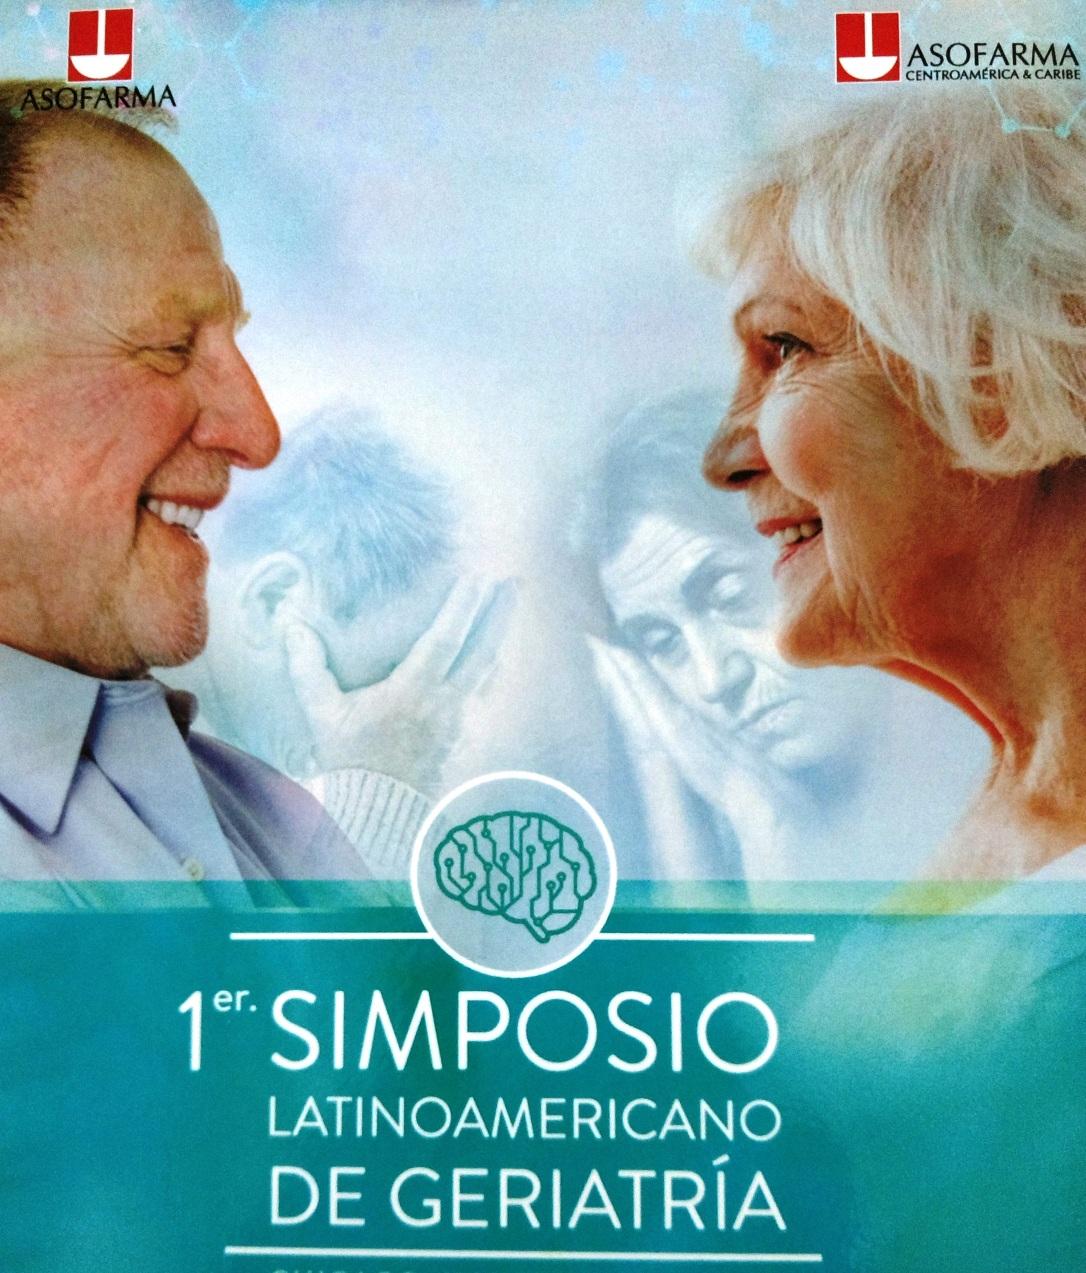 primer simposio latinoamericano de geriatria.jpg